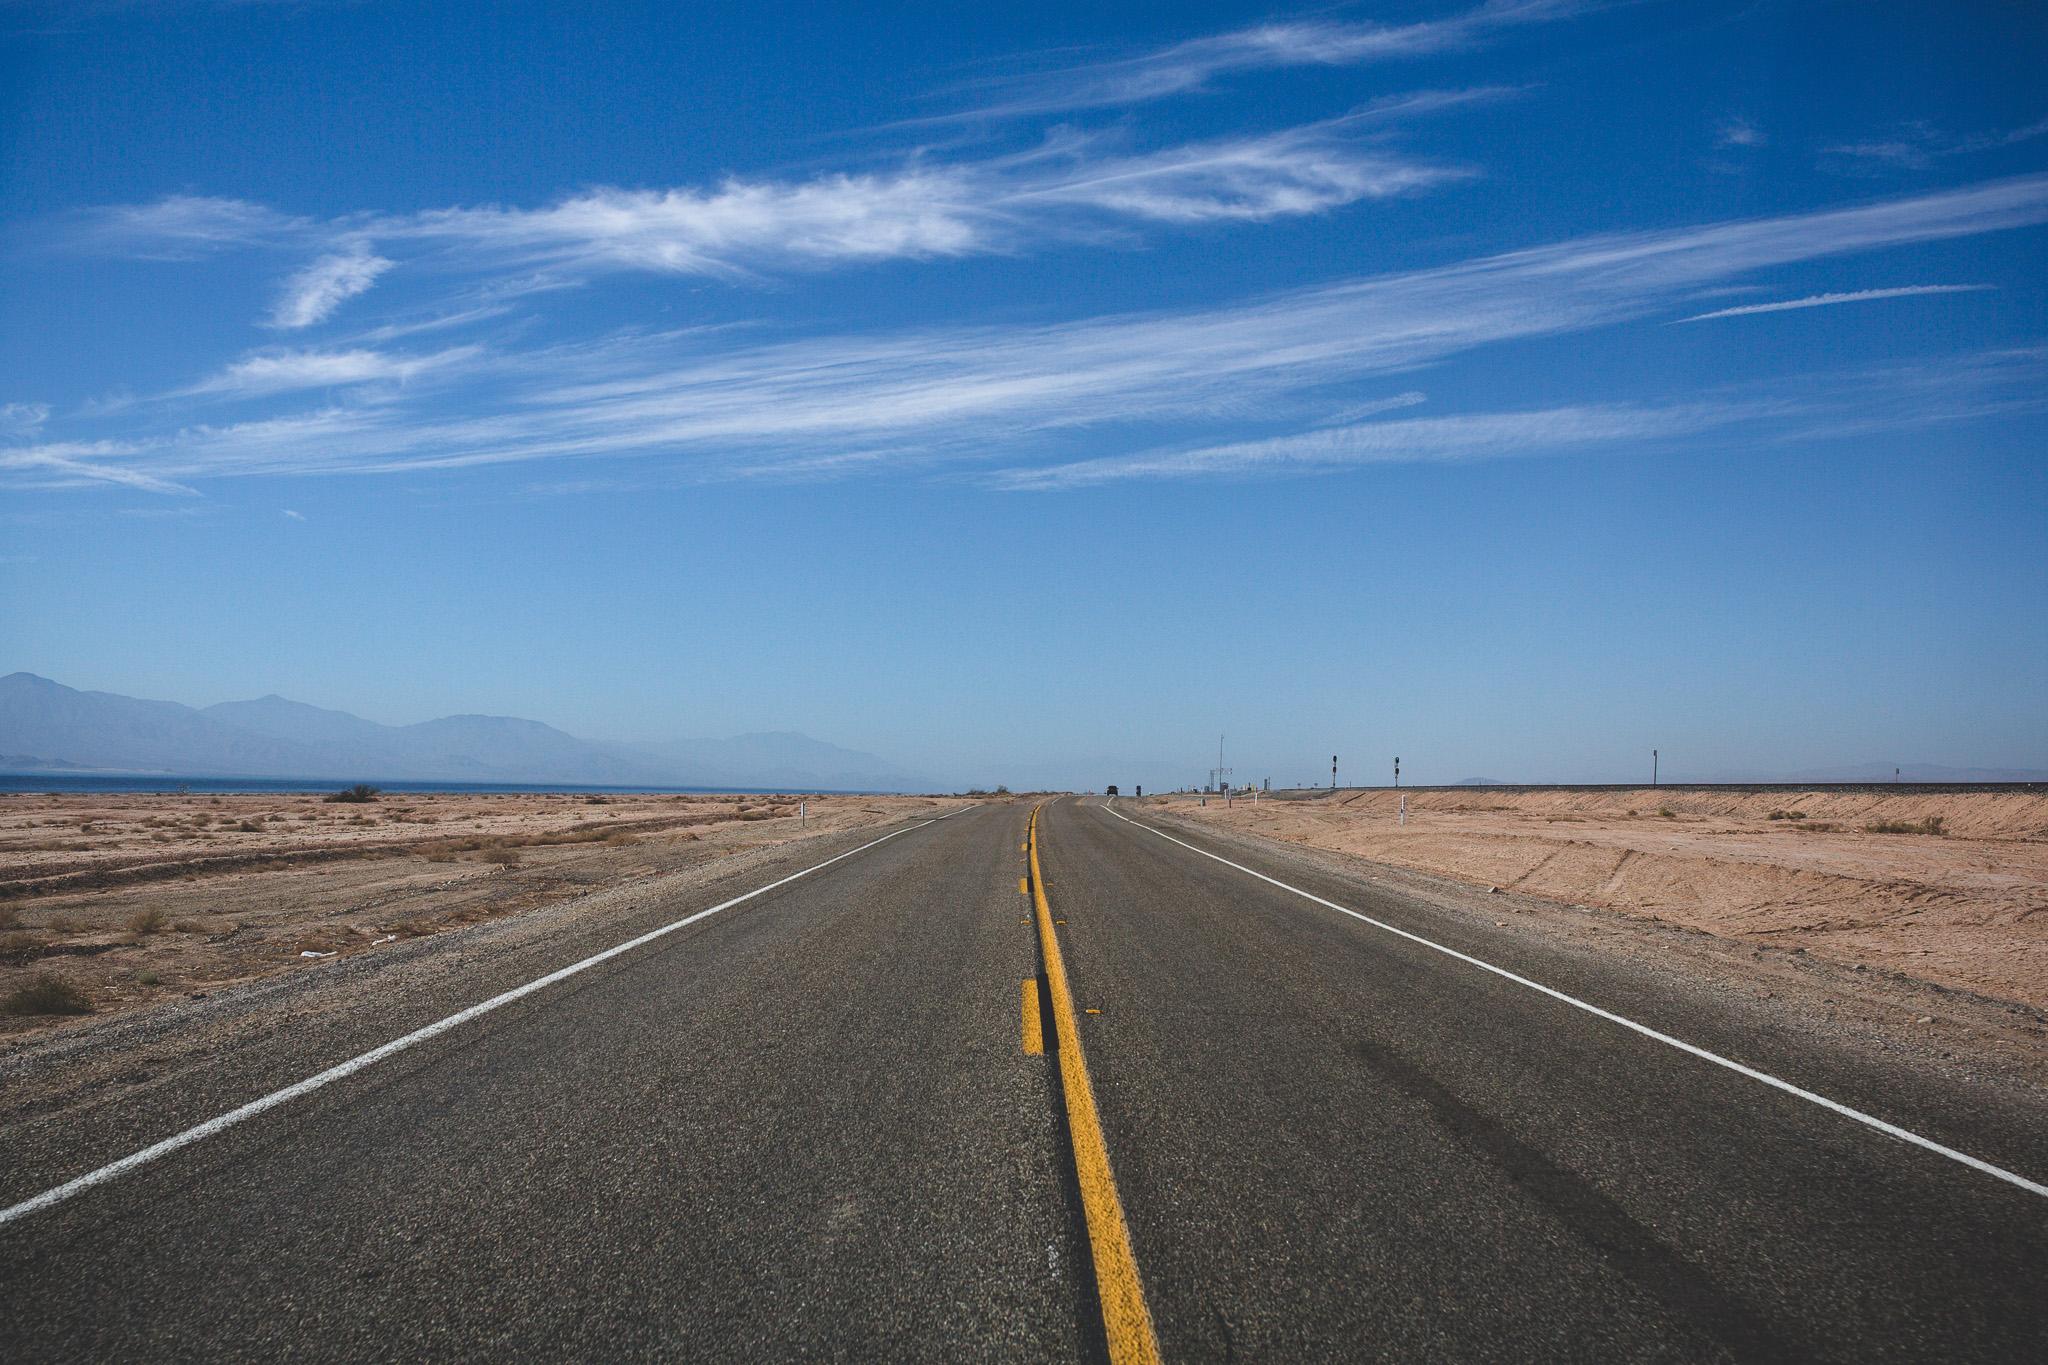 road-trip-jonathan-kuhn-photography